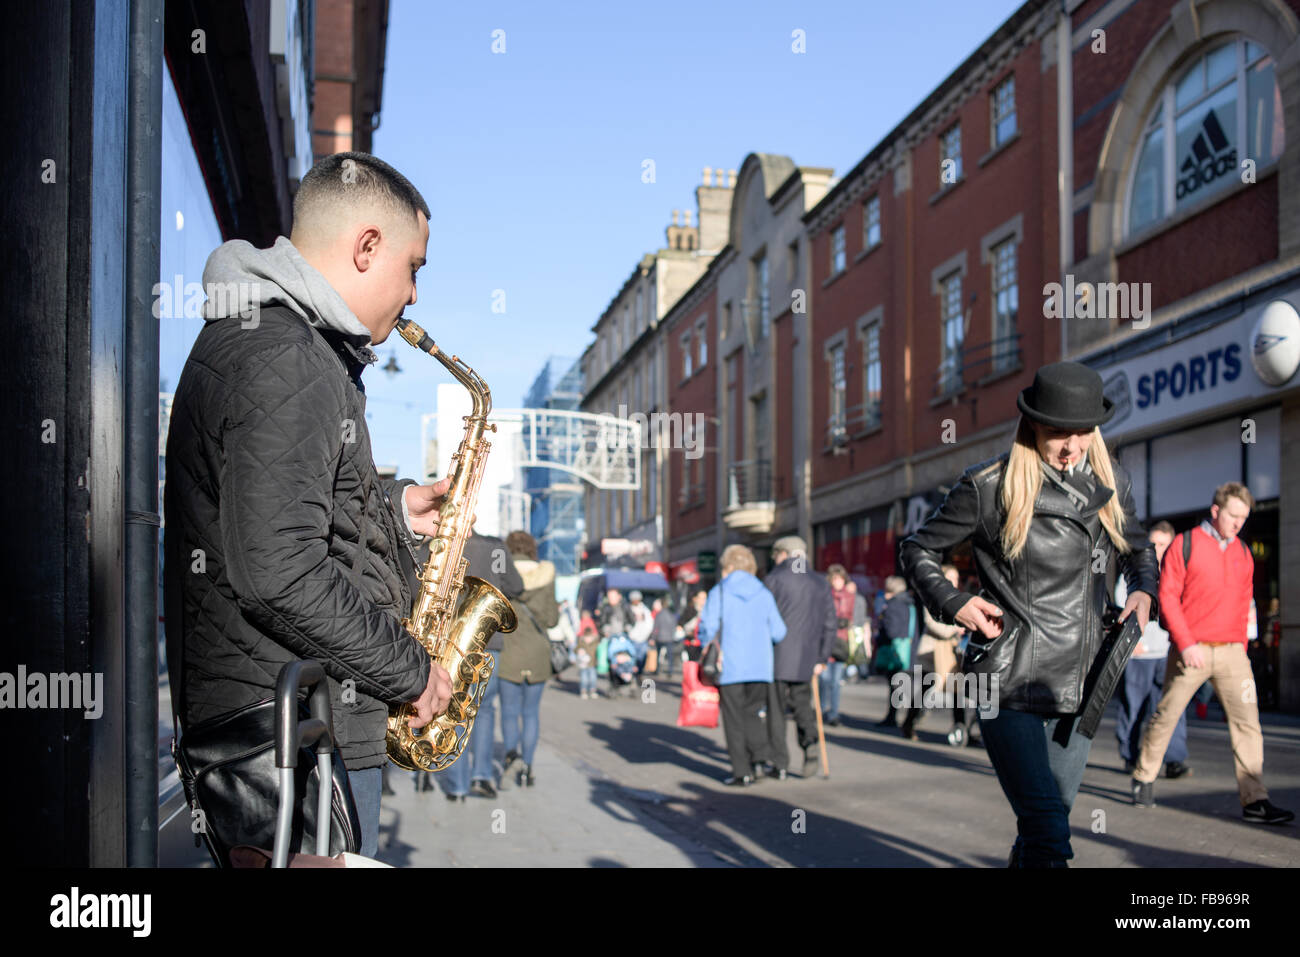 Eastern European Street Musician ,Busking on the city centre streets of Nottingham,UK. - Stock Image